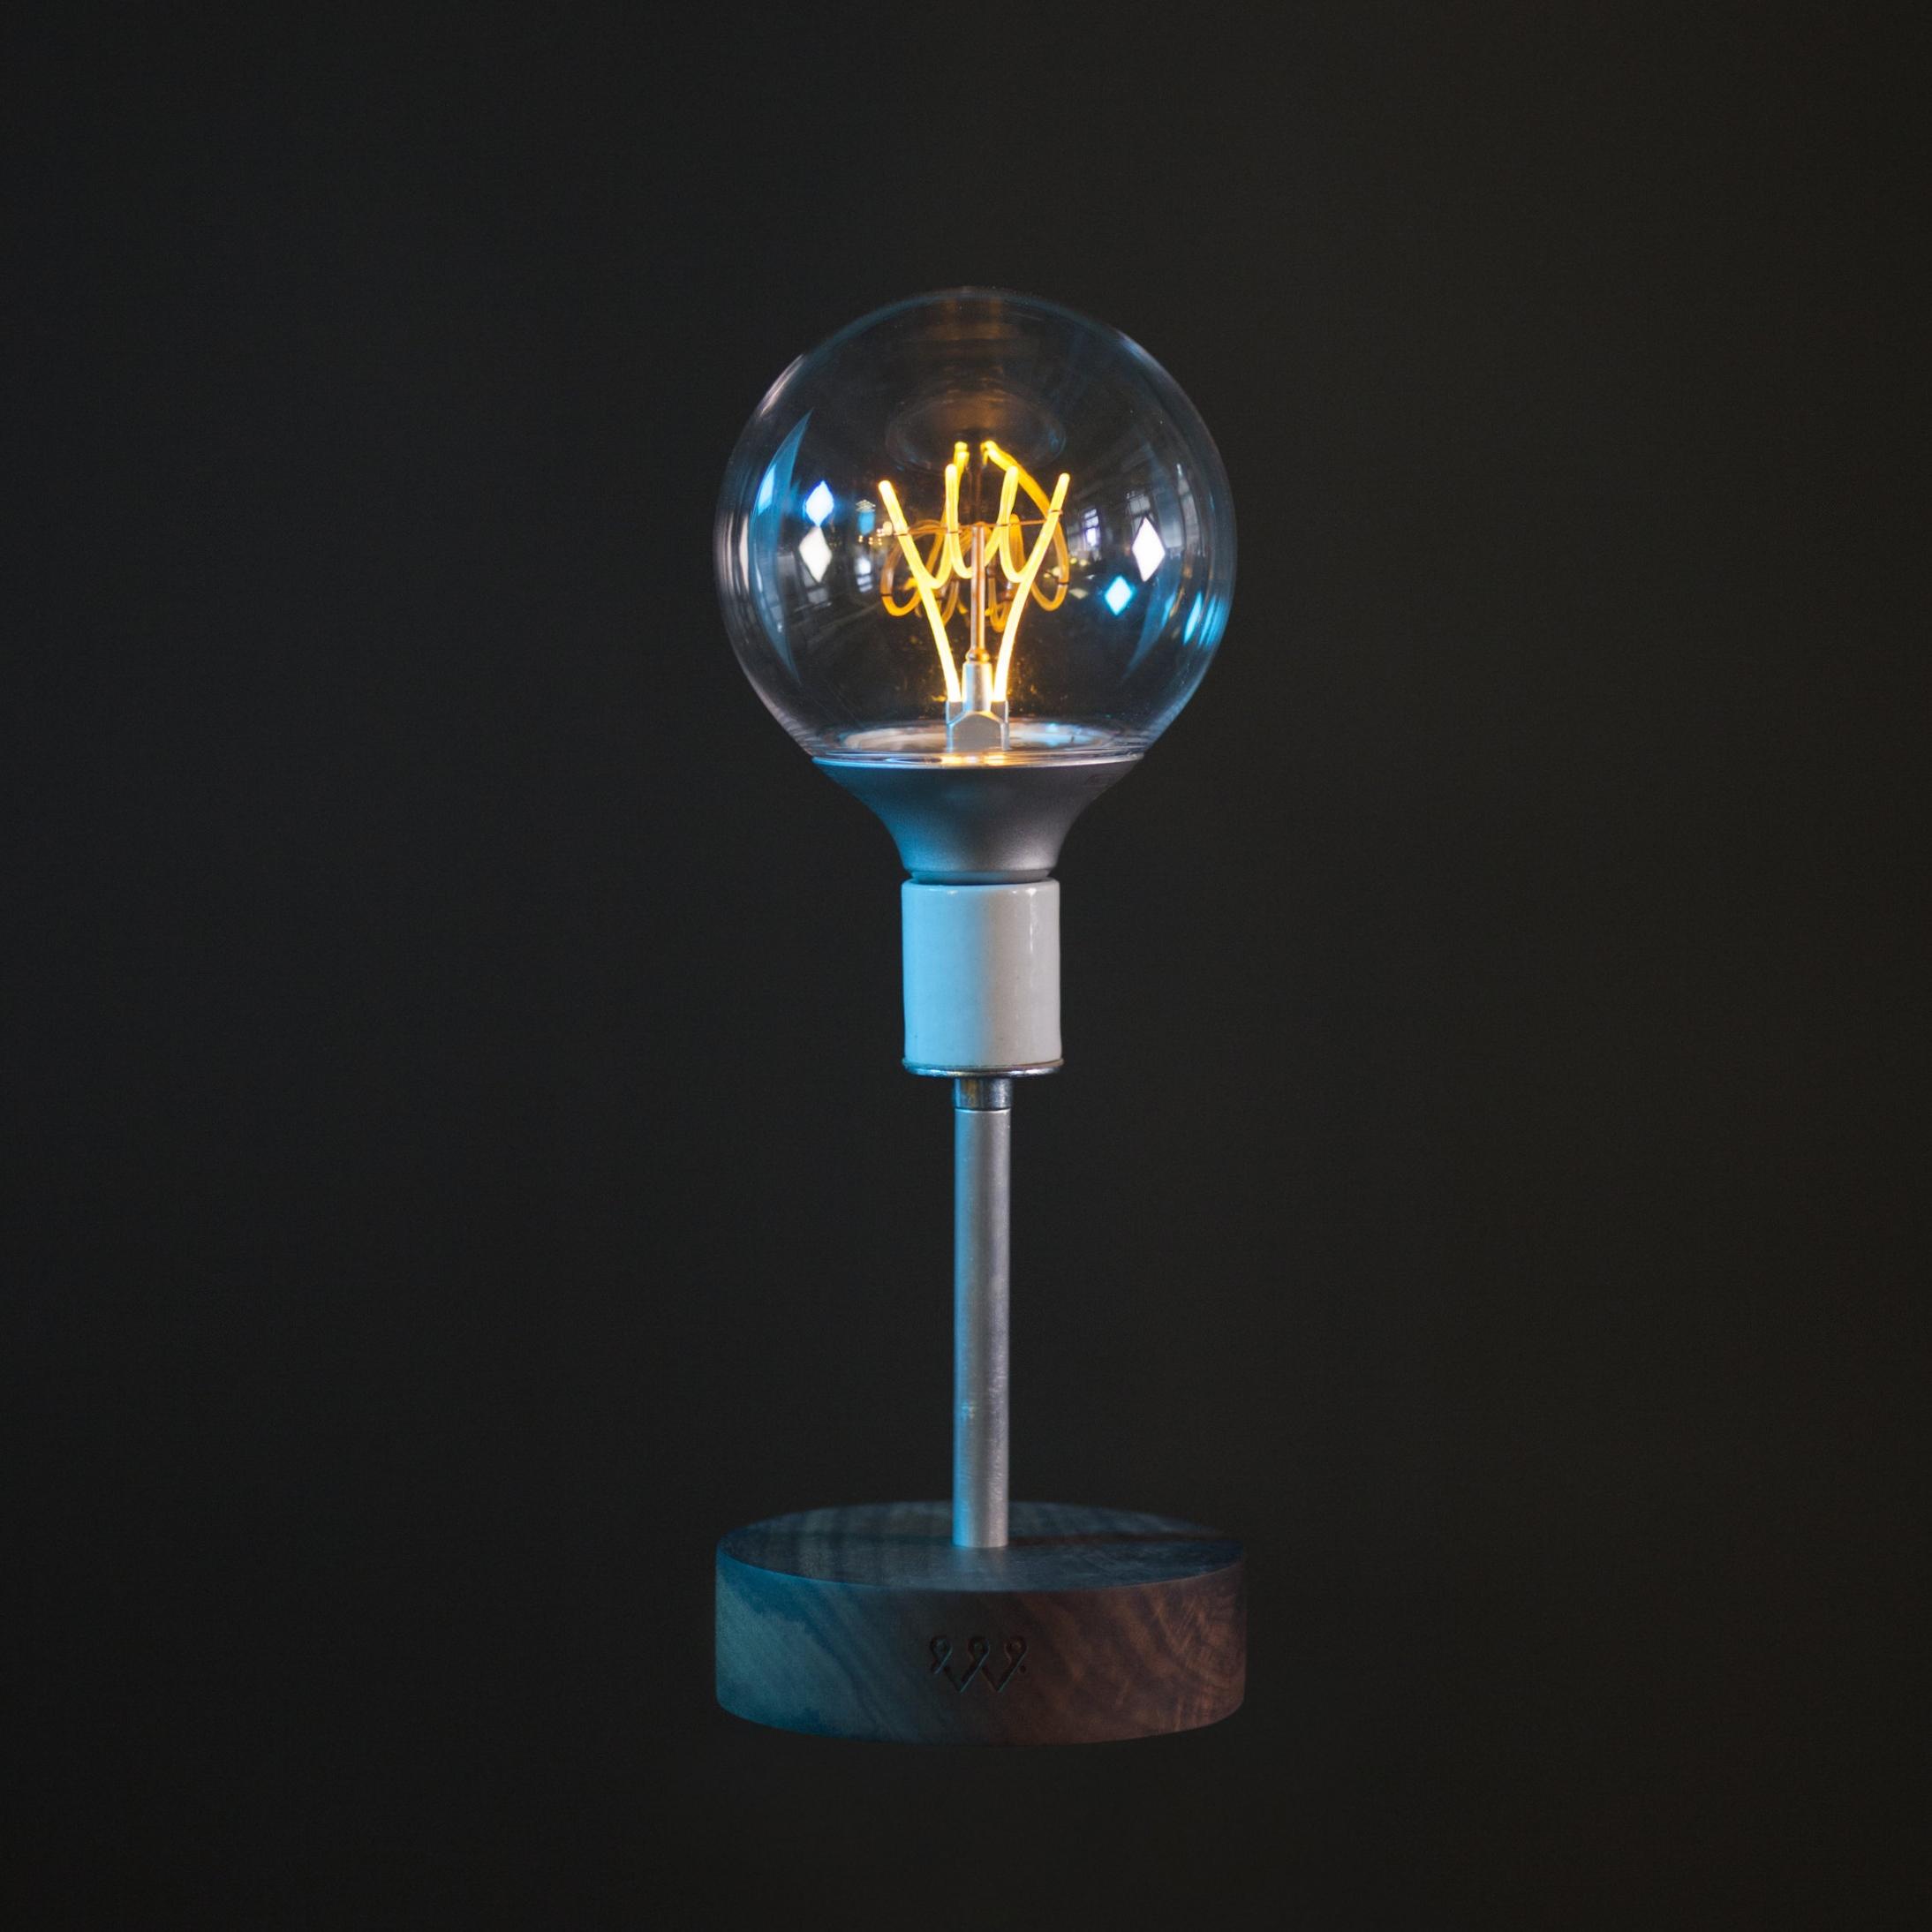 watts-lamp_full.jpg